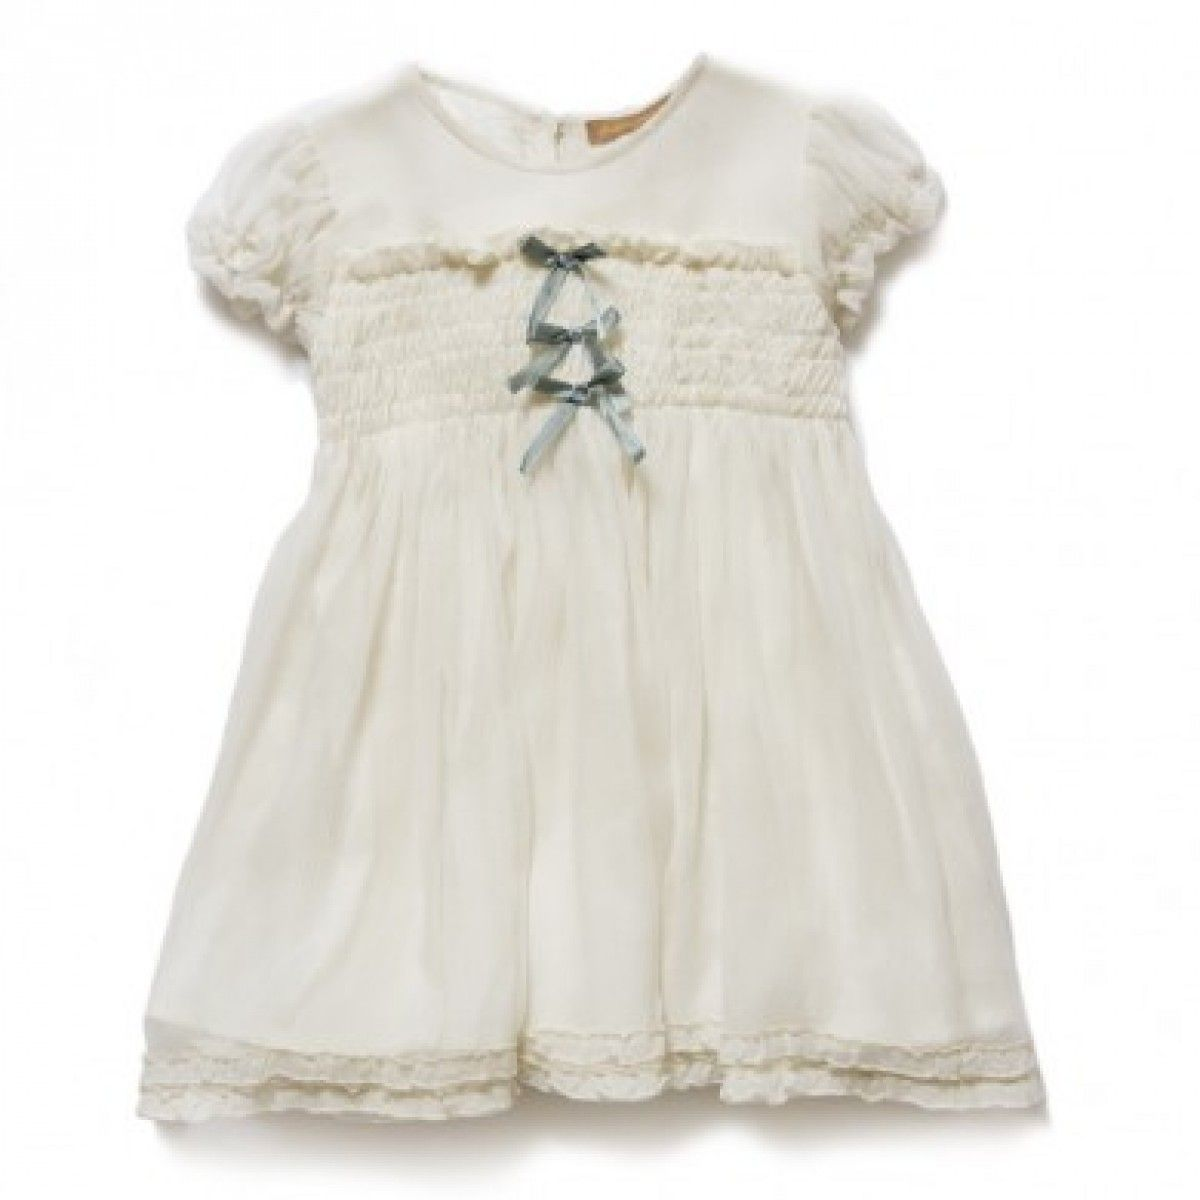 Baby vintage ribbon dress creamblue babies flower